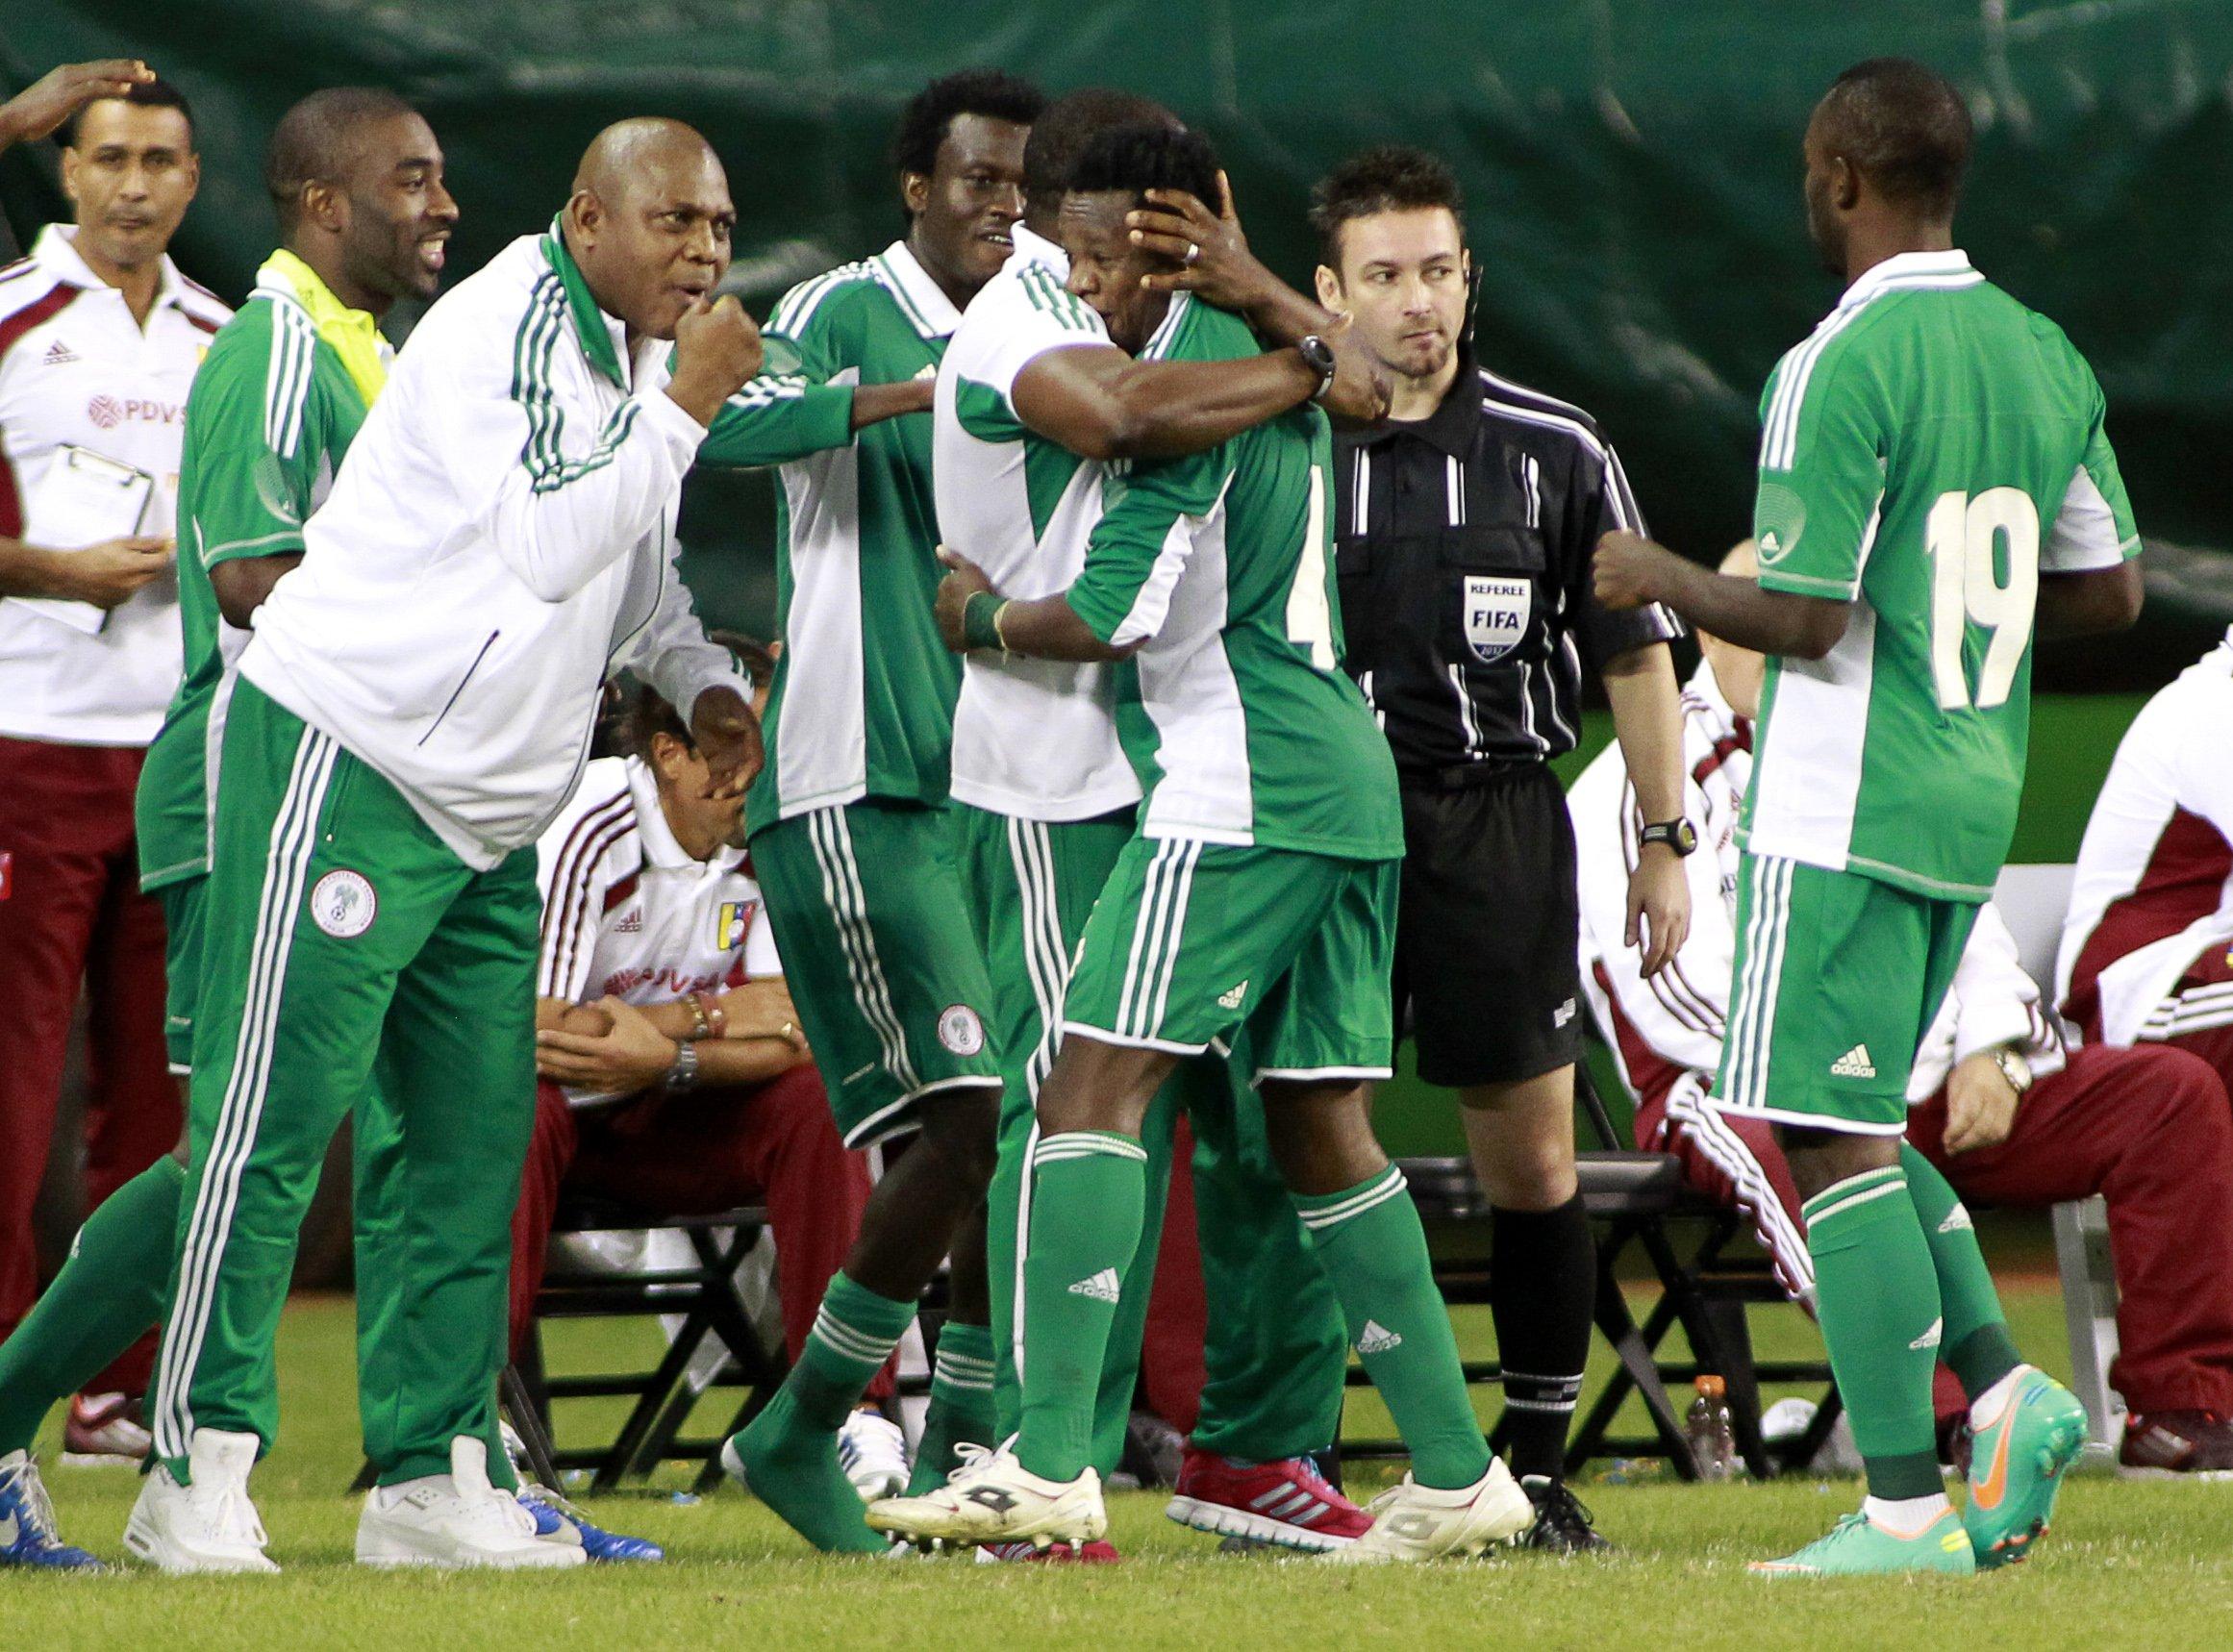 No African team can reach World Cup semis - Cameroon legend Omam-Biyik